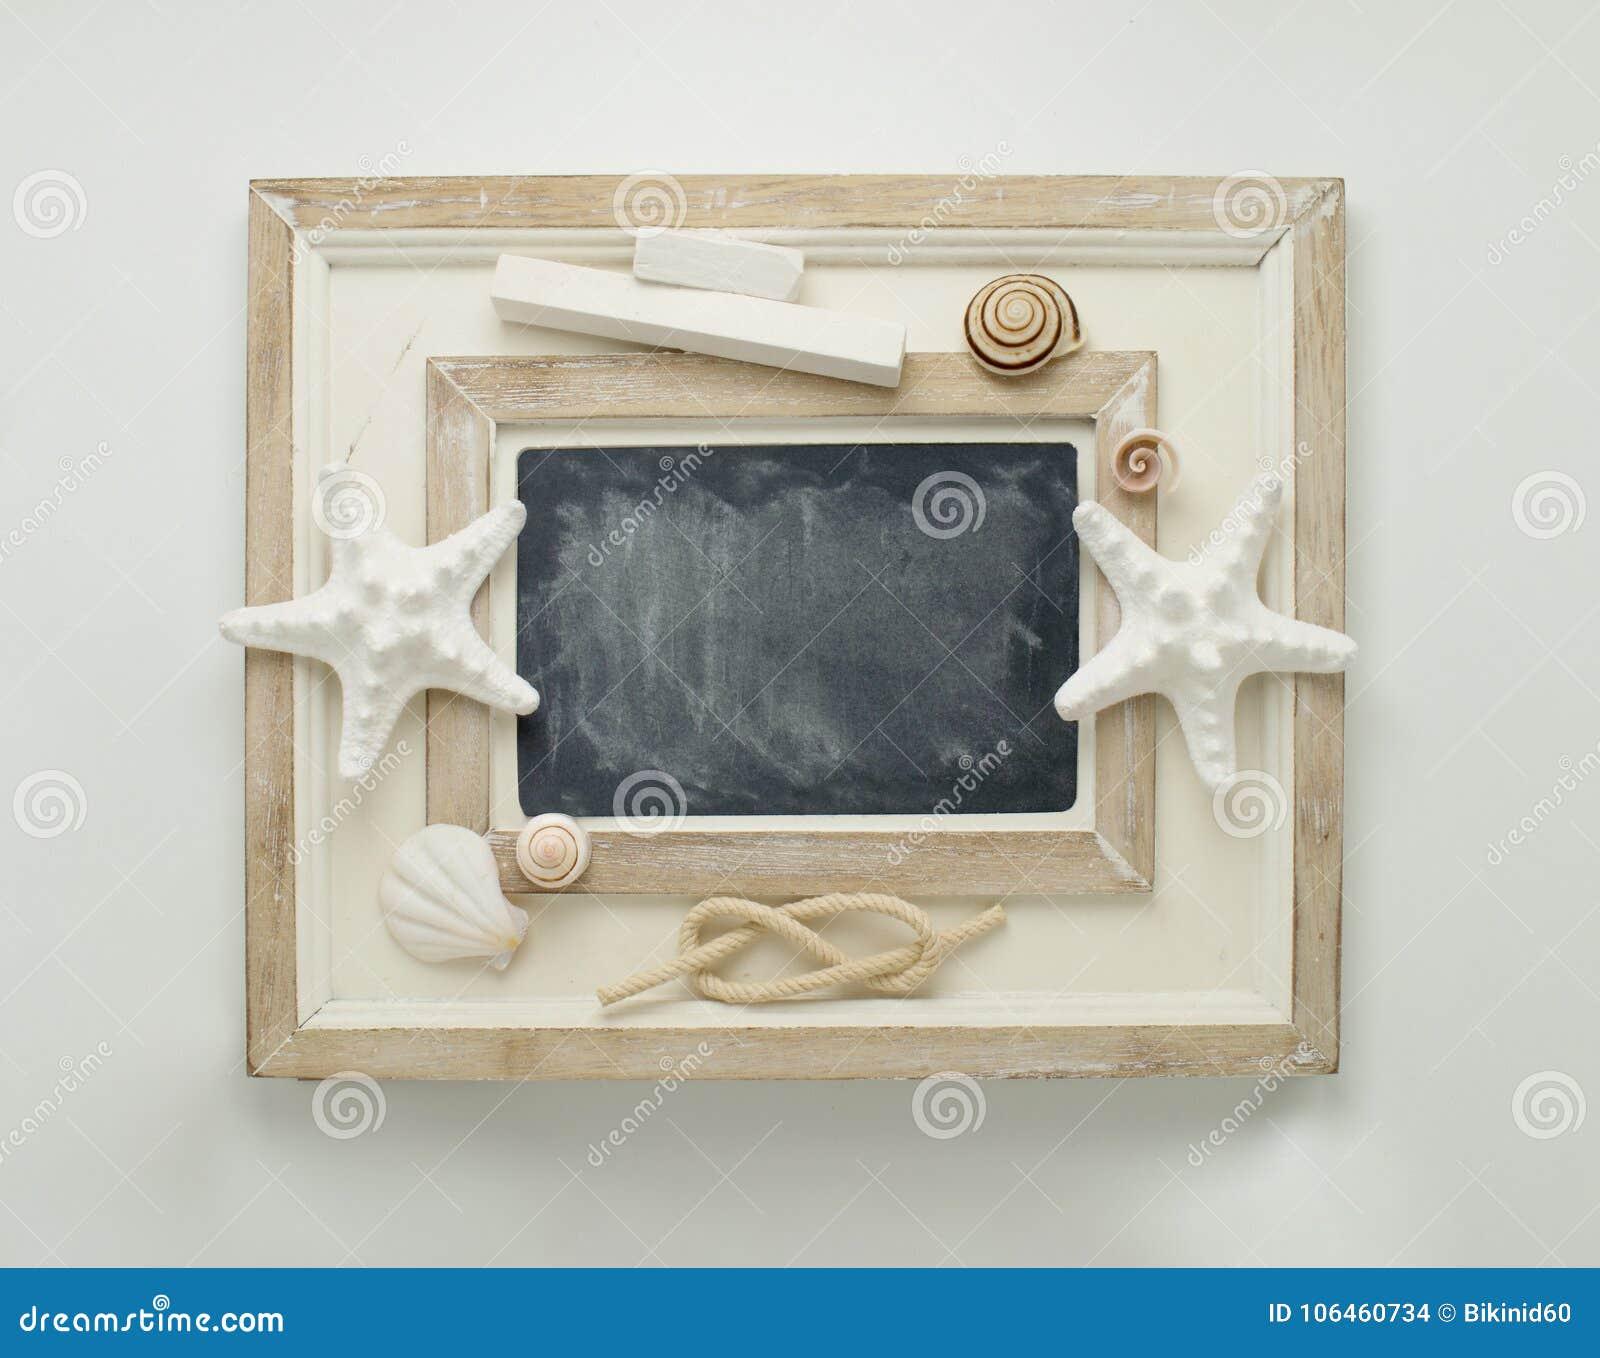 Marine Decorated Chalkboard. Stock Photo - Image of space, frame ...